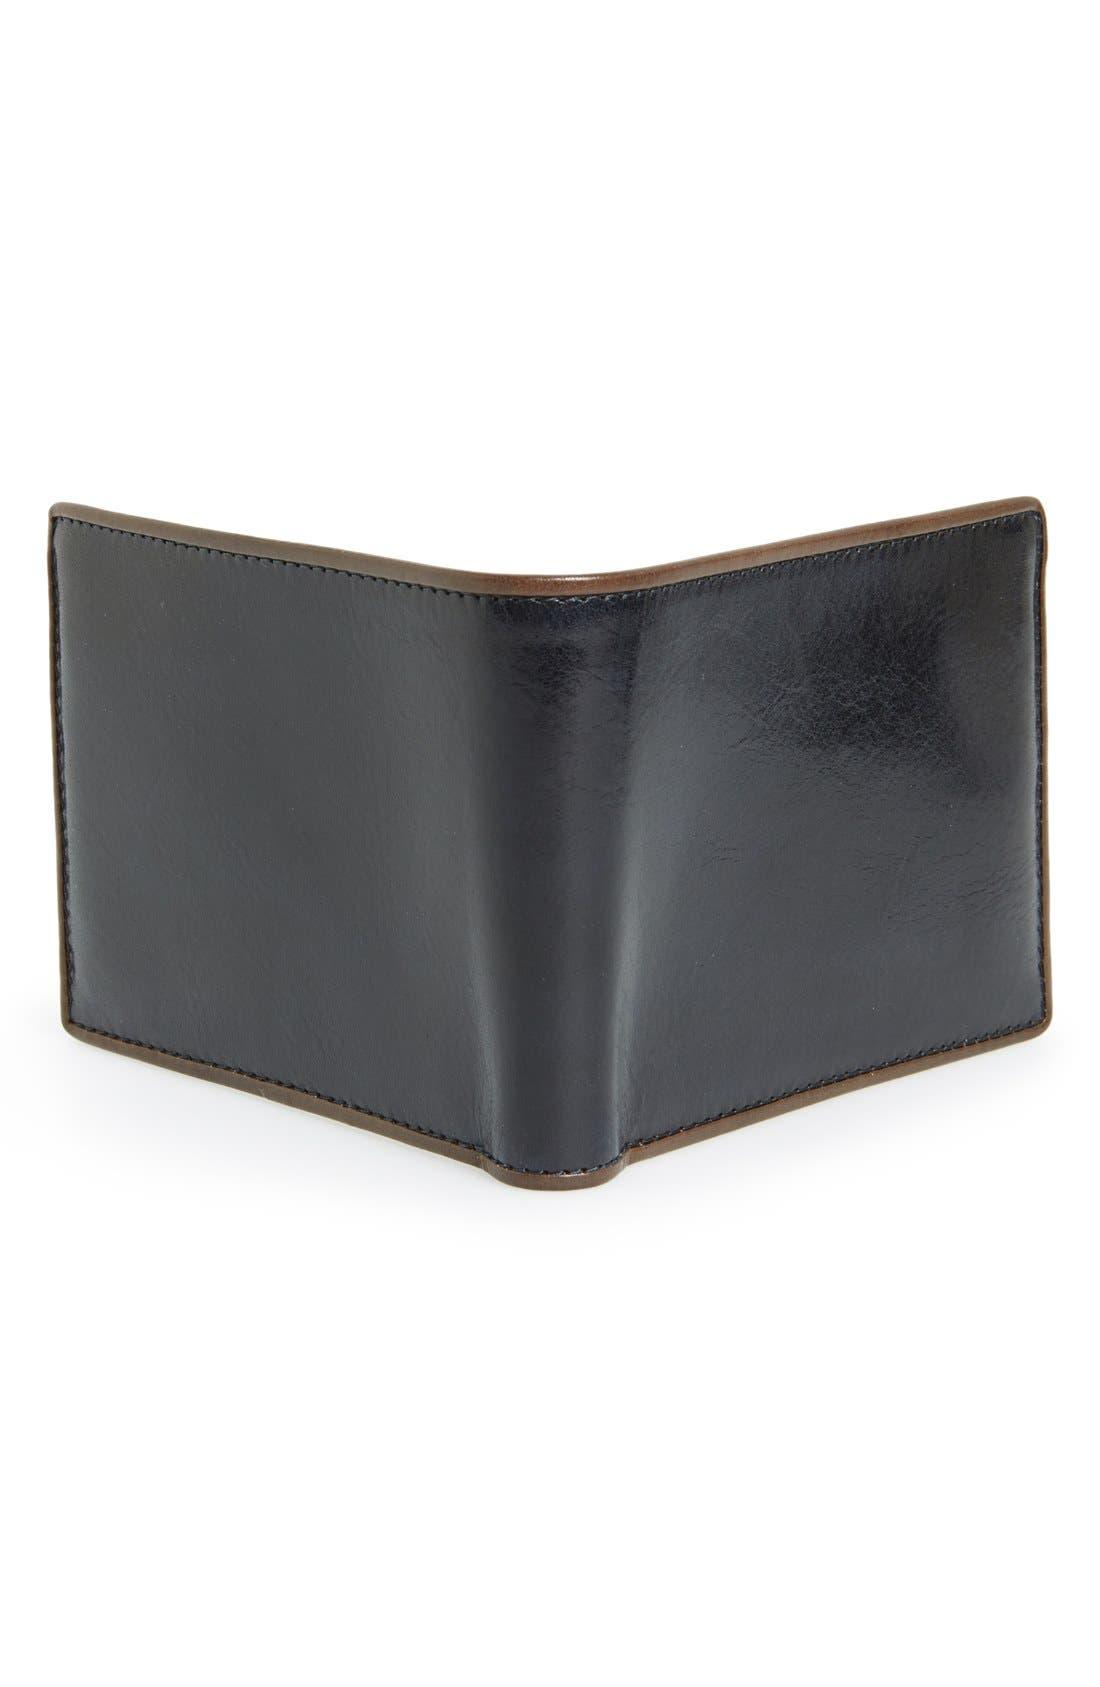 Alternate Image 3  - Bosca 'Montreal' Wallet